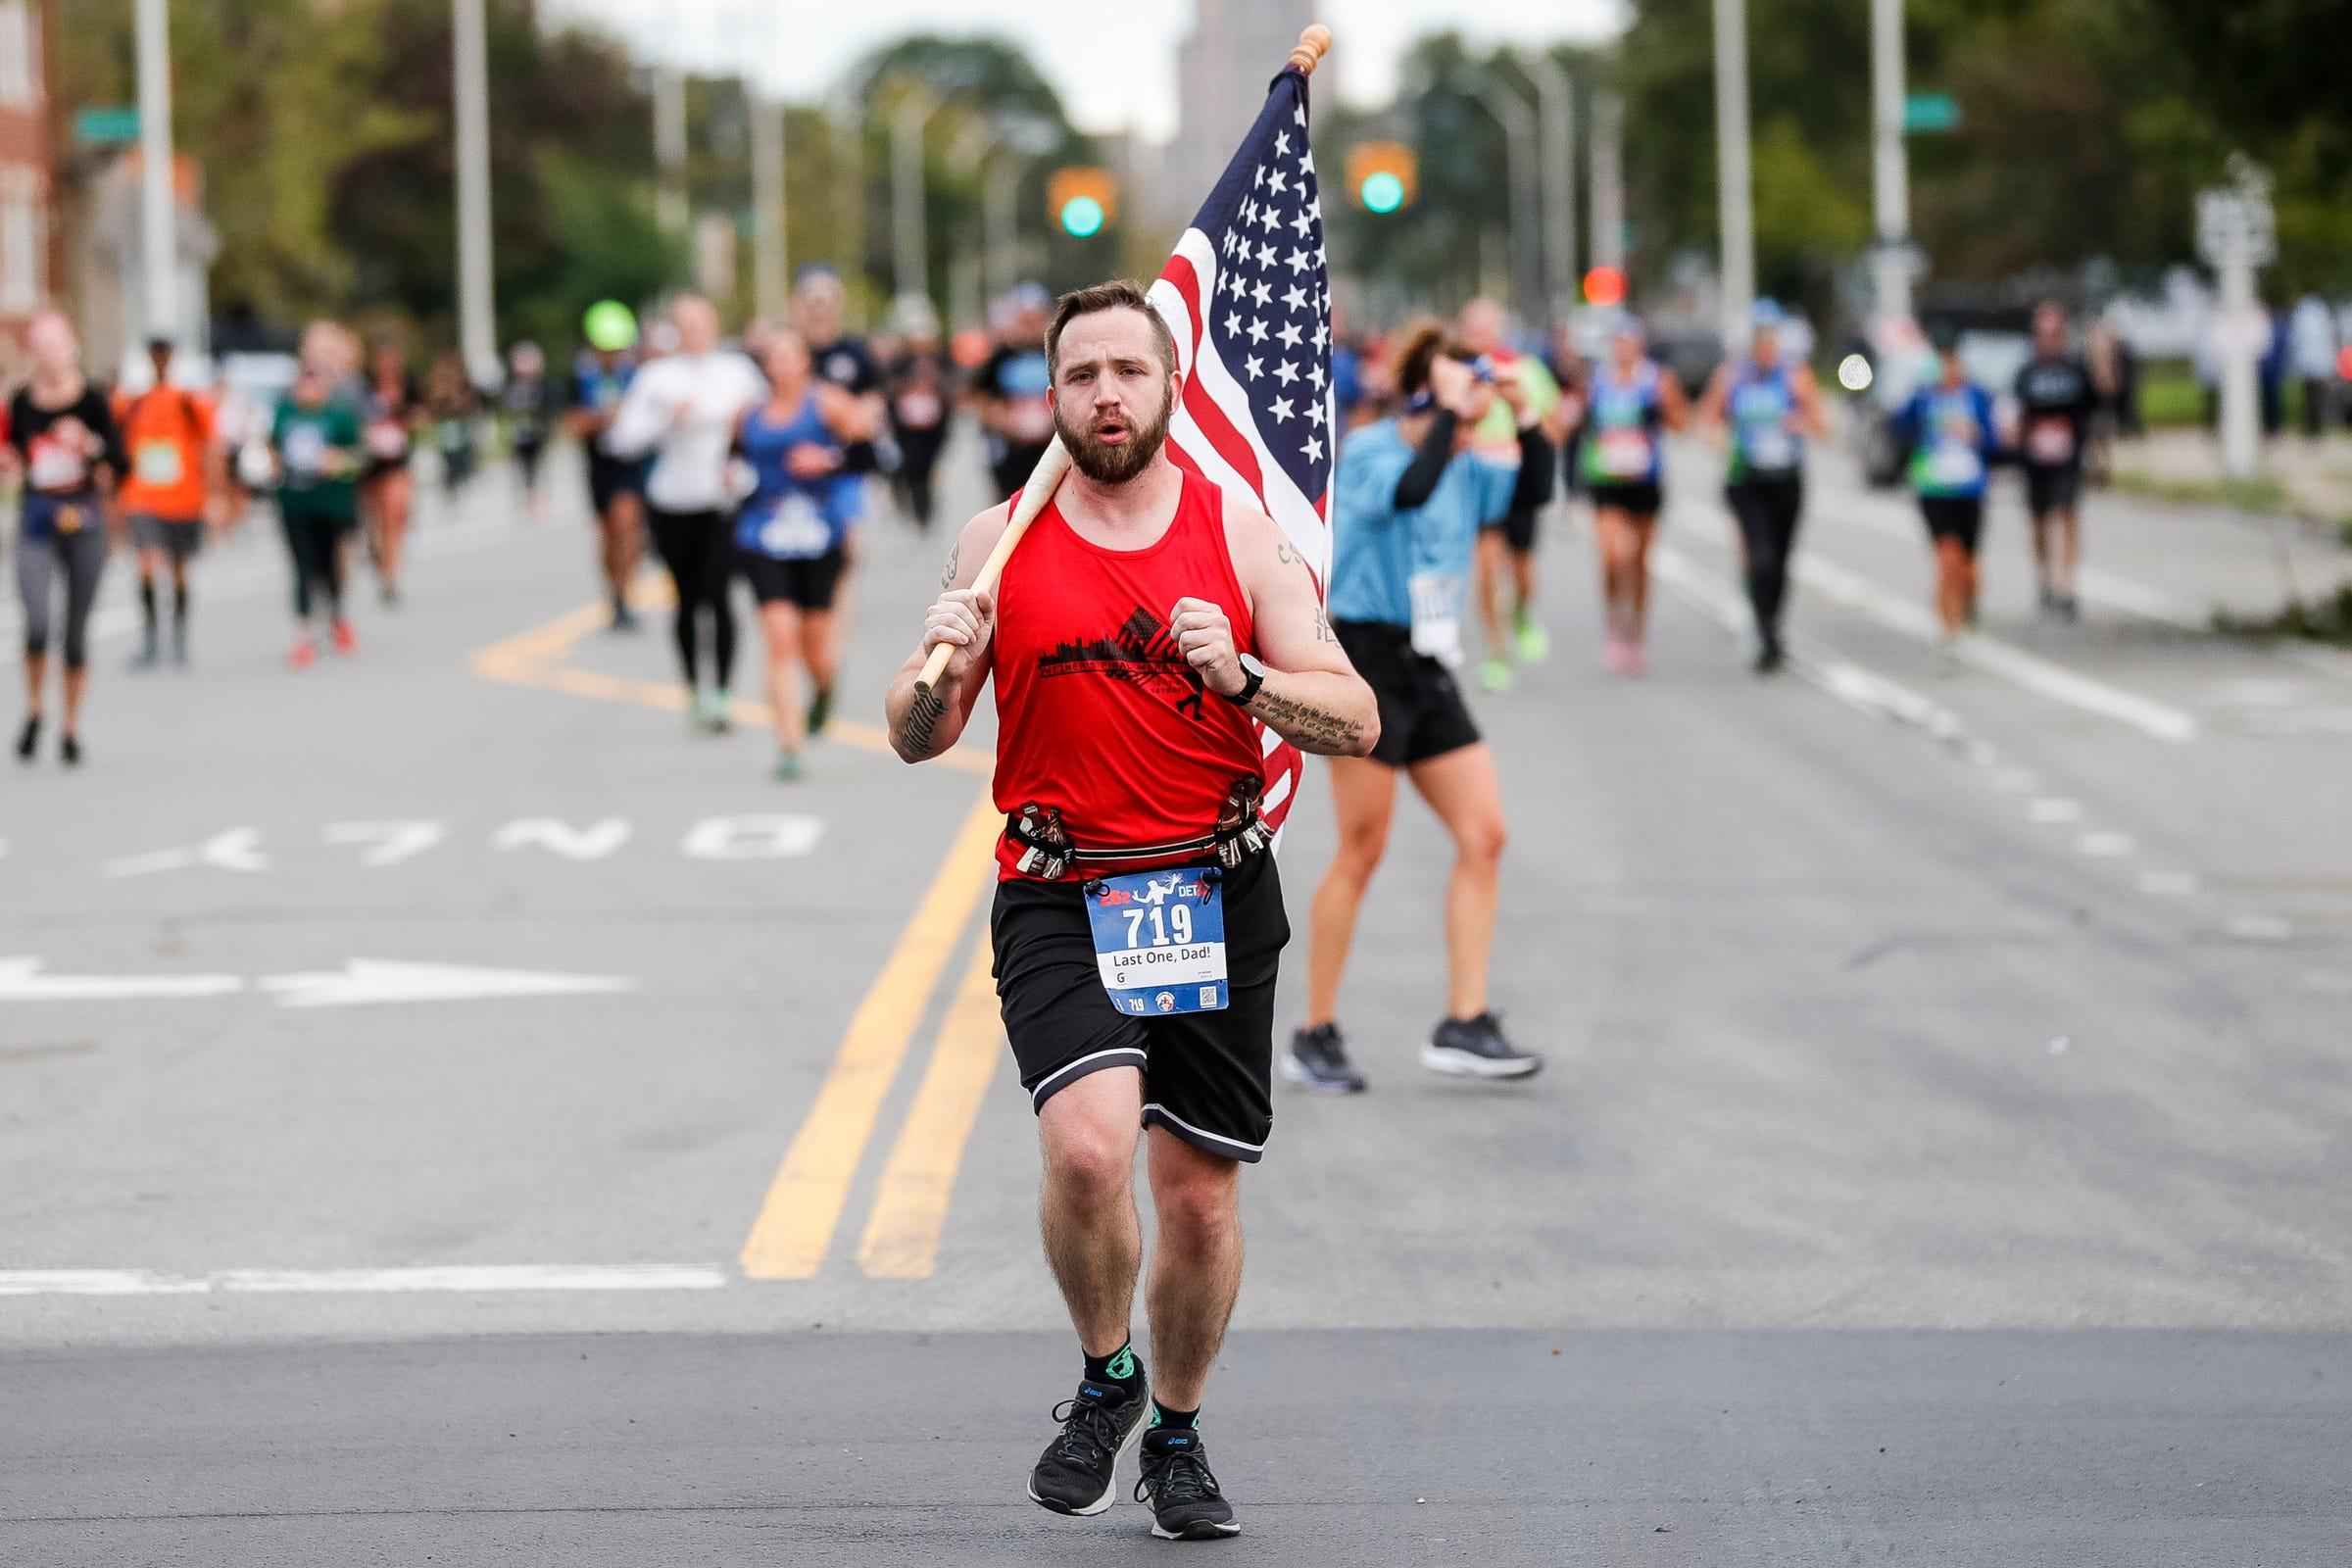 2021 Detroit Free Press Marathon: Army veteran carries flag all 26.2 miles for final race